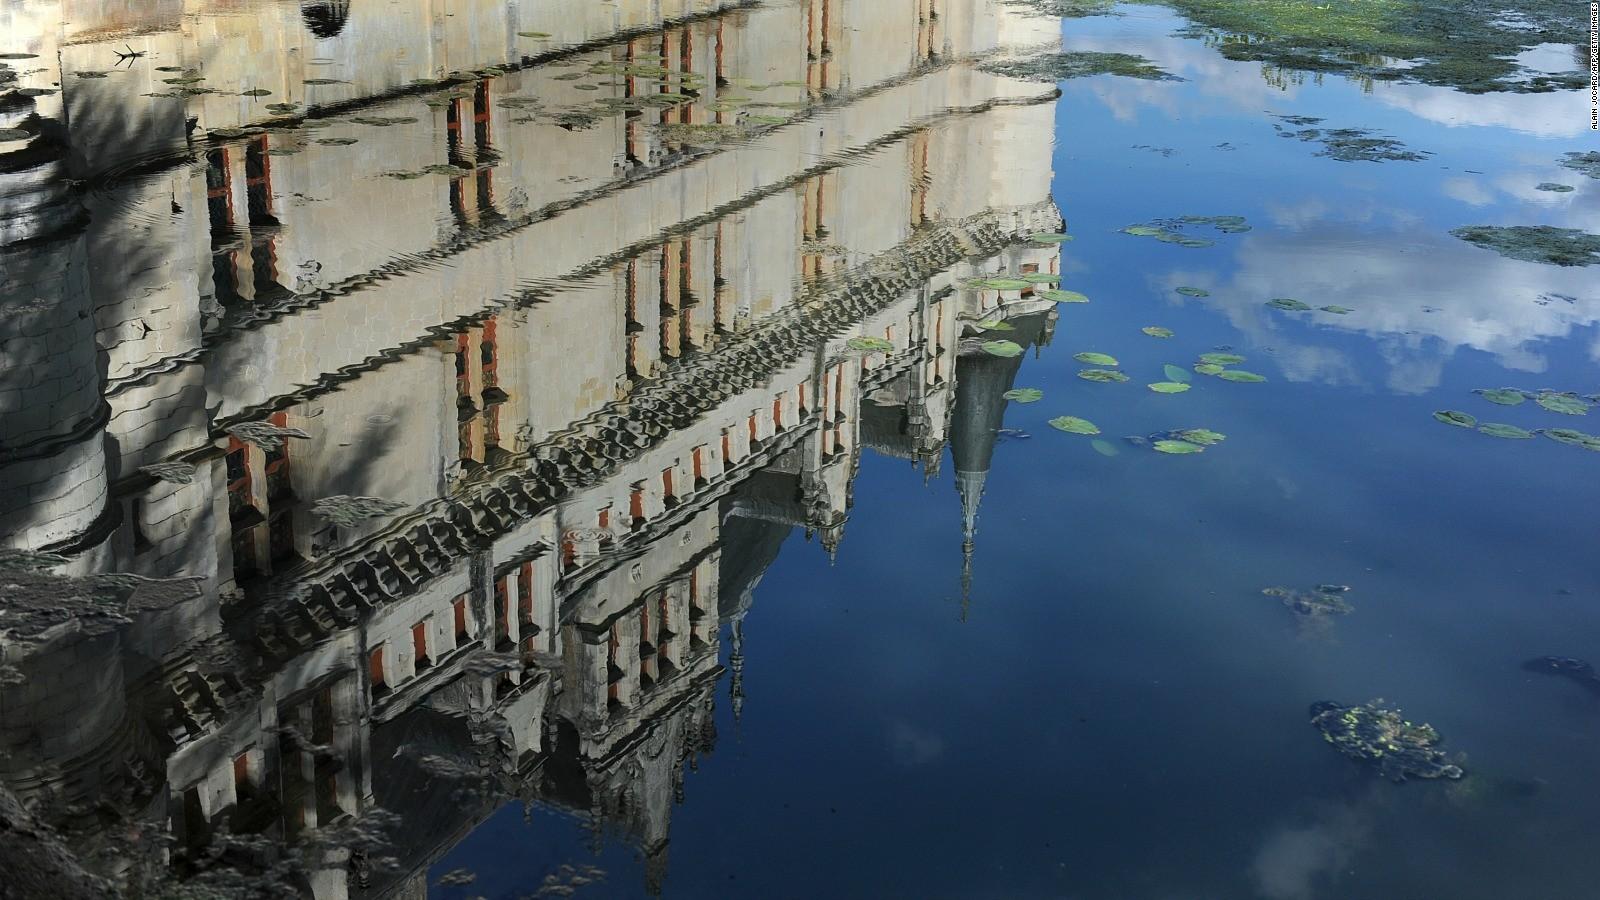 Loire Valley, France: 5 best castles | CNN Travel